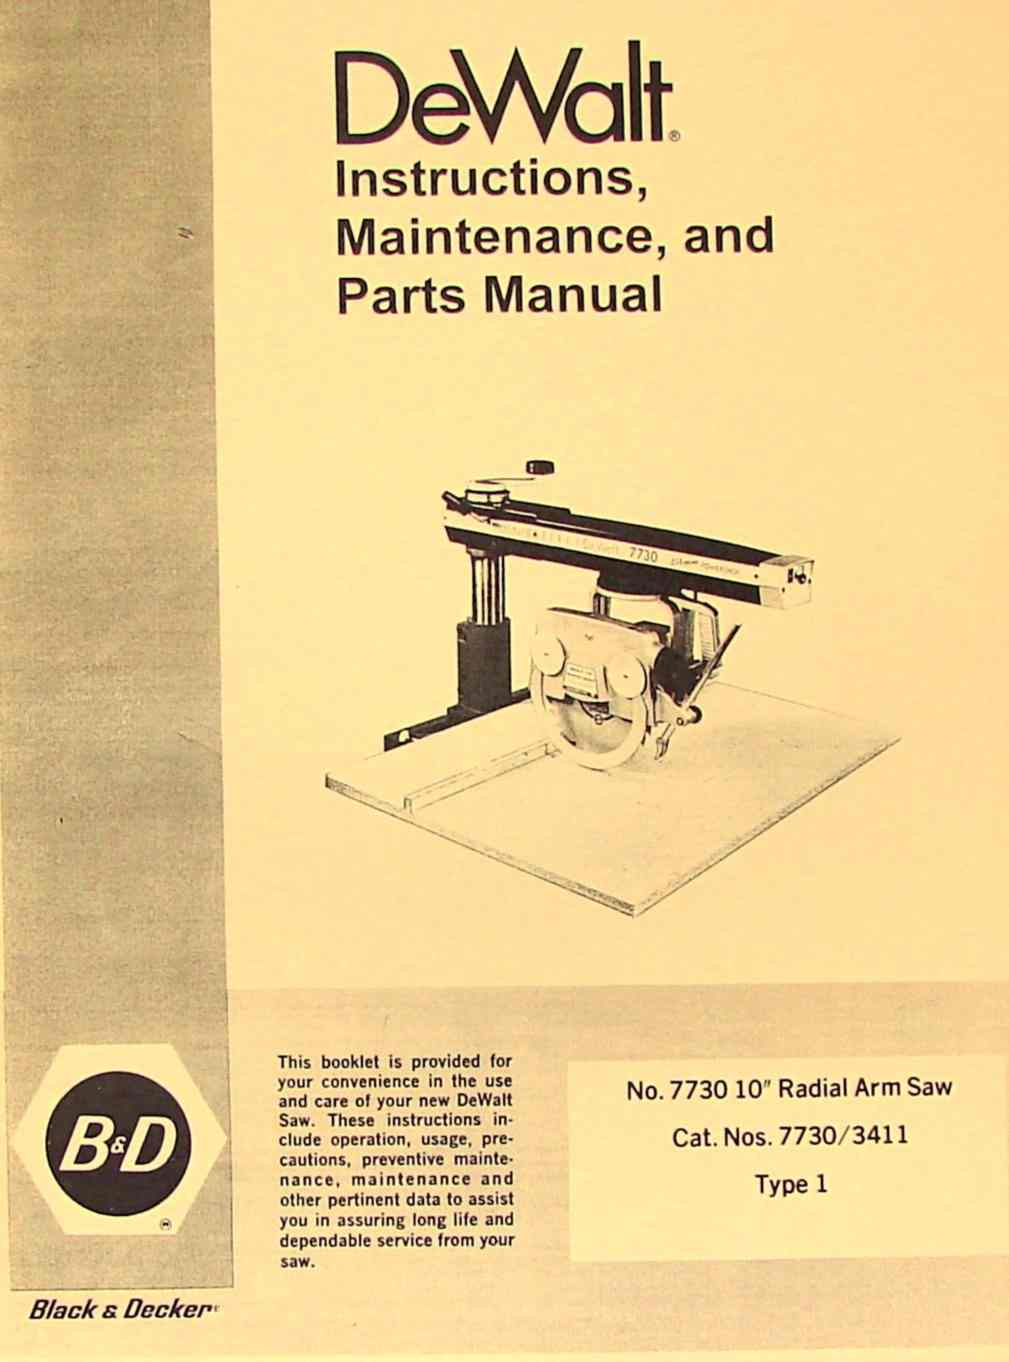 black and decker radial arm saw manual